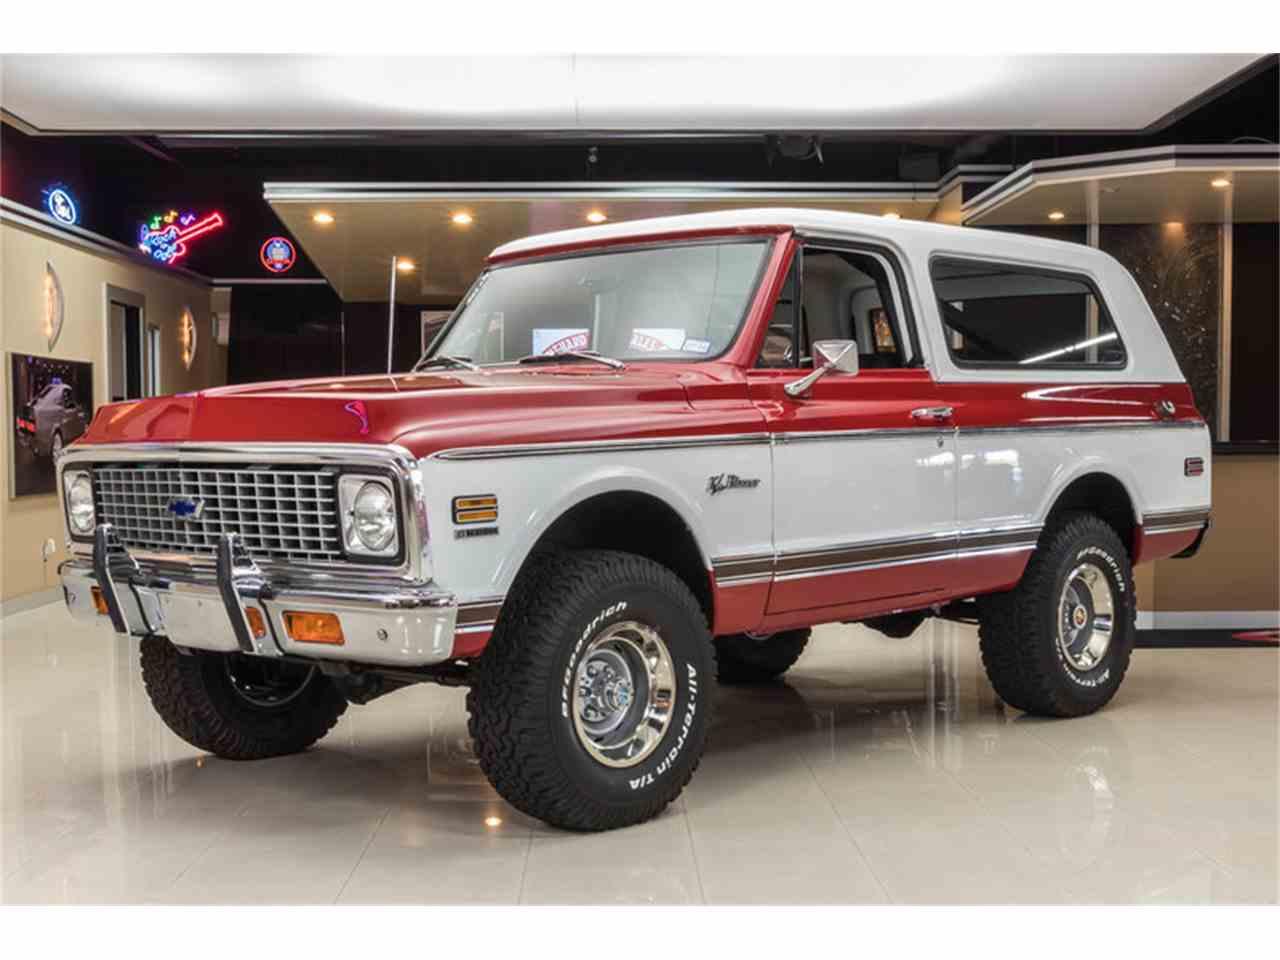 Blazer chevy blazer : 1972 Chevrolet Blazer for Sale   ClassicCars.com   CC-984221